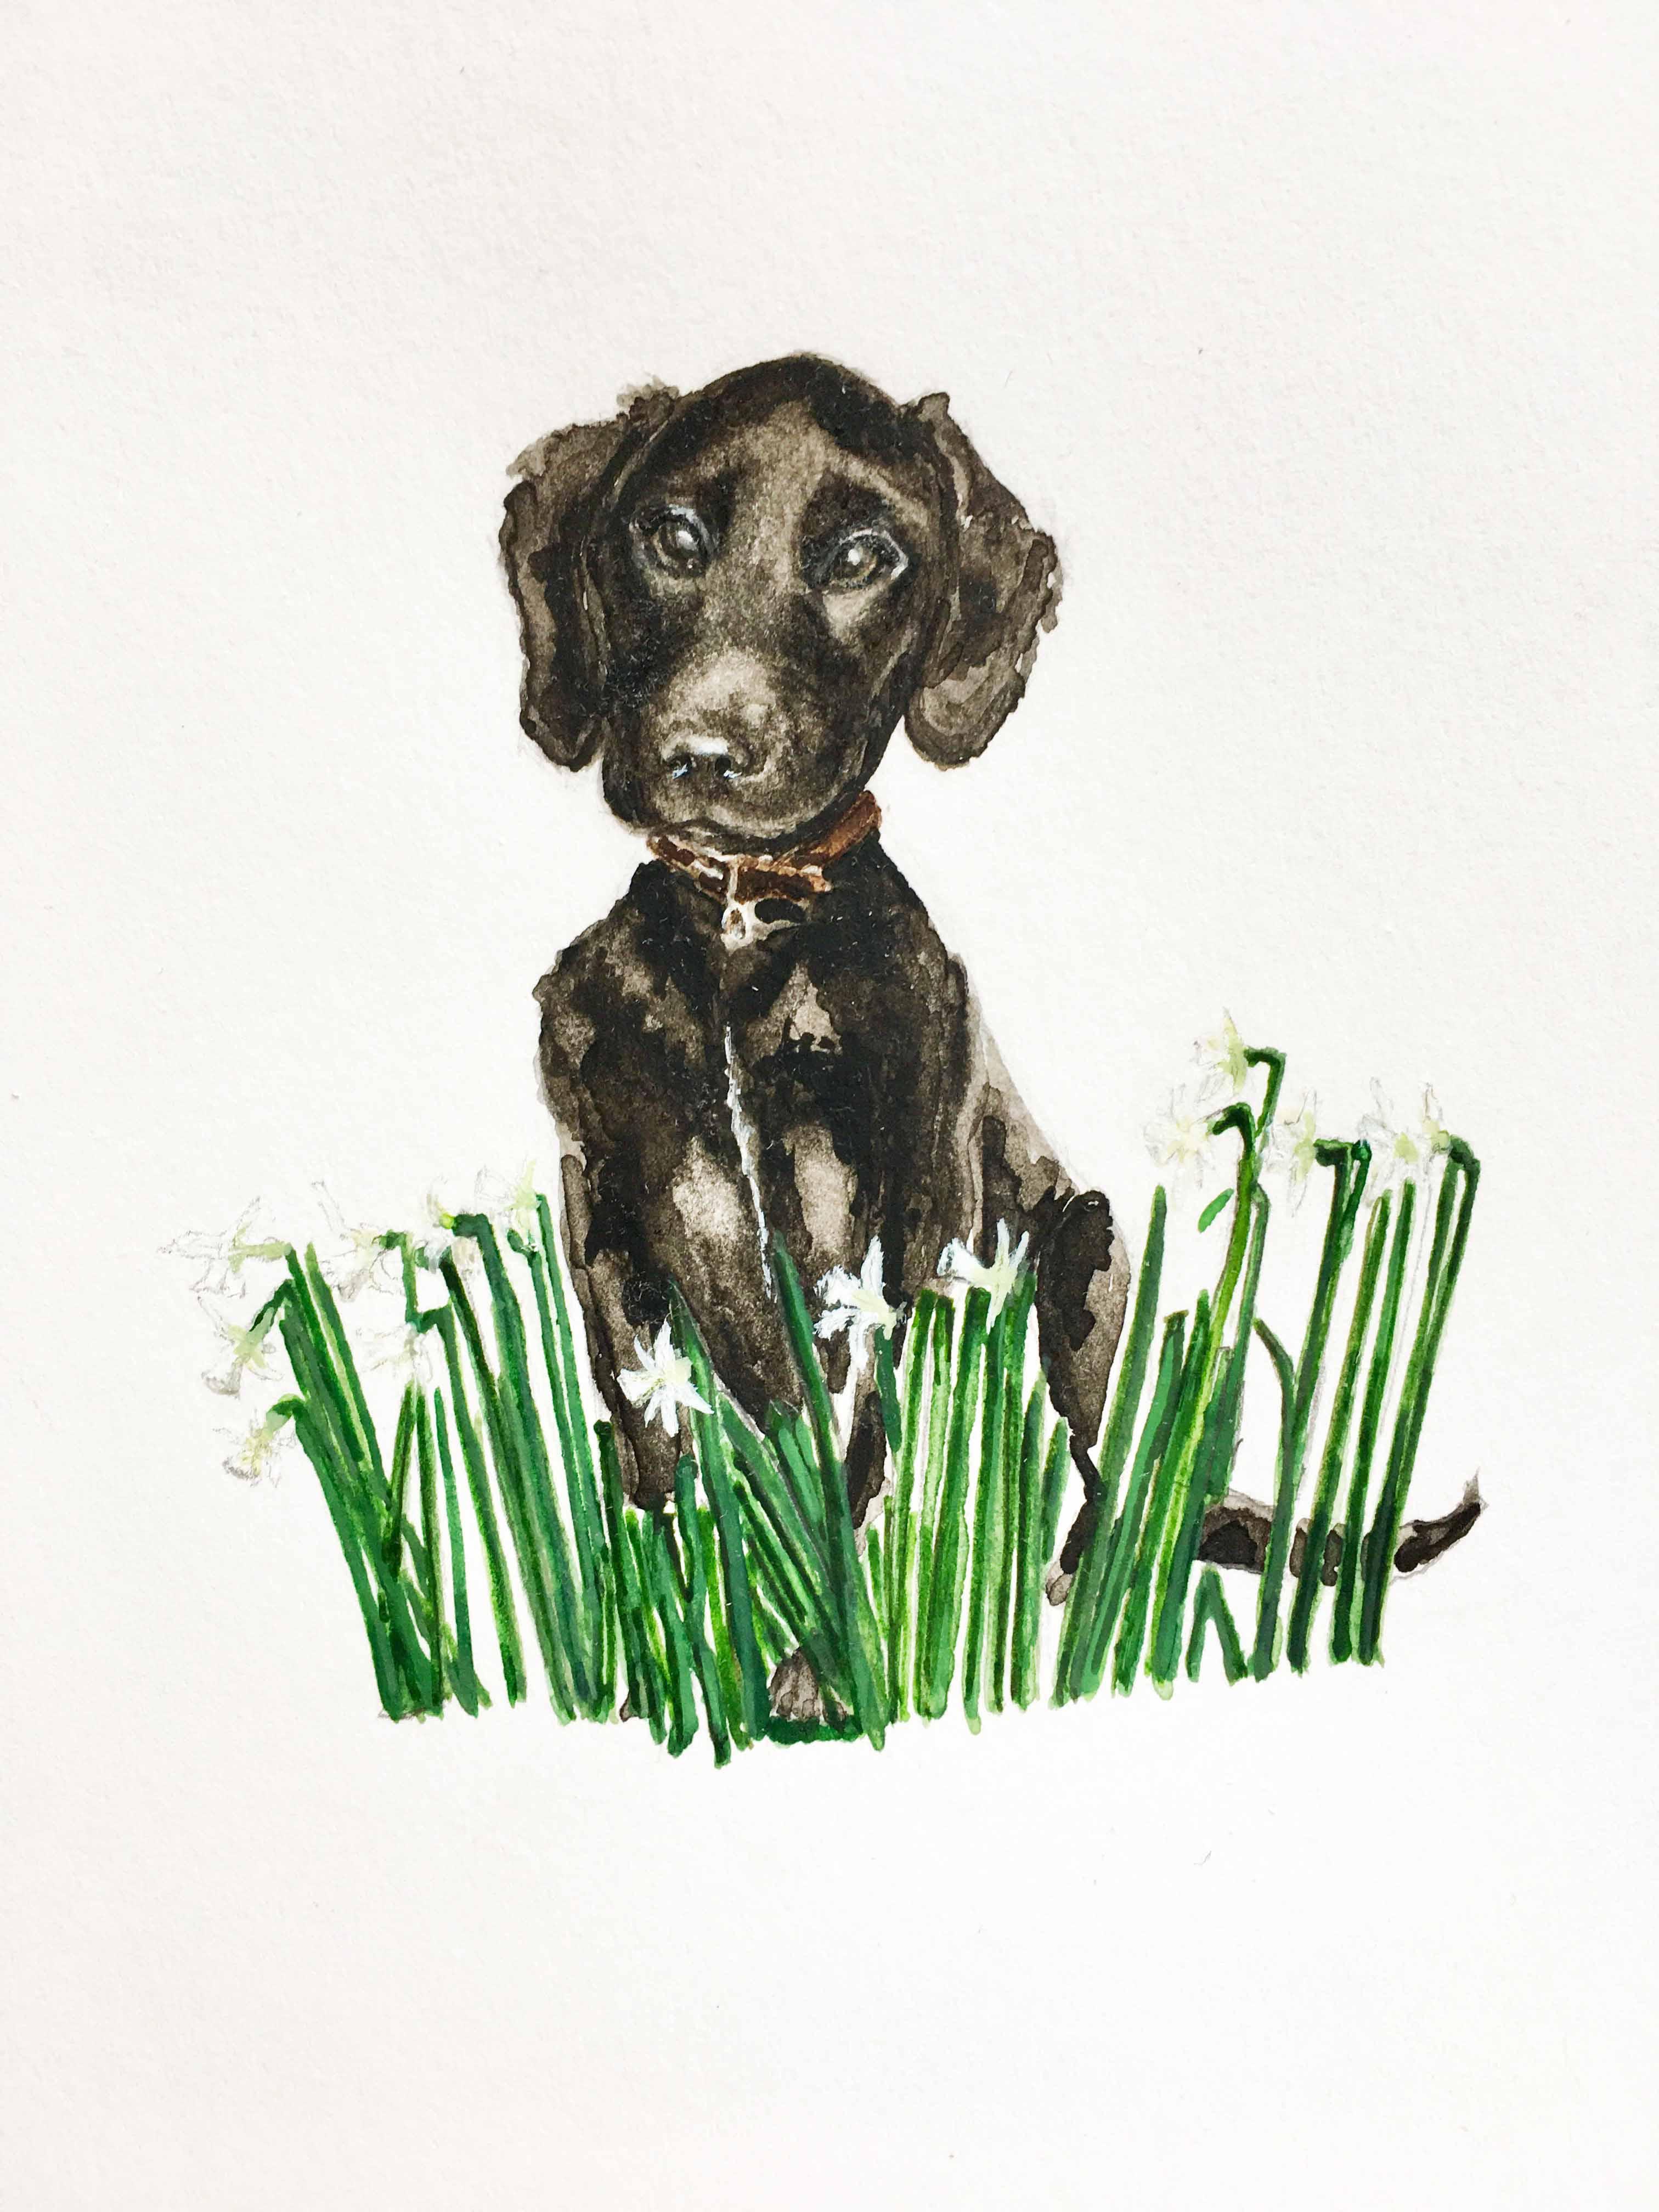 Labrador puppy playing